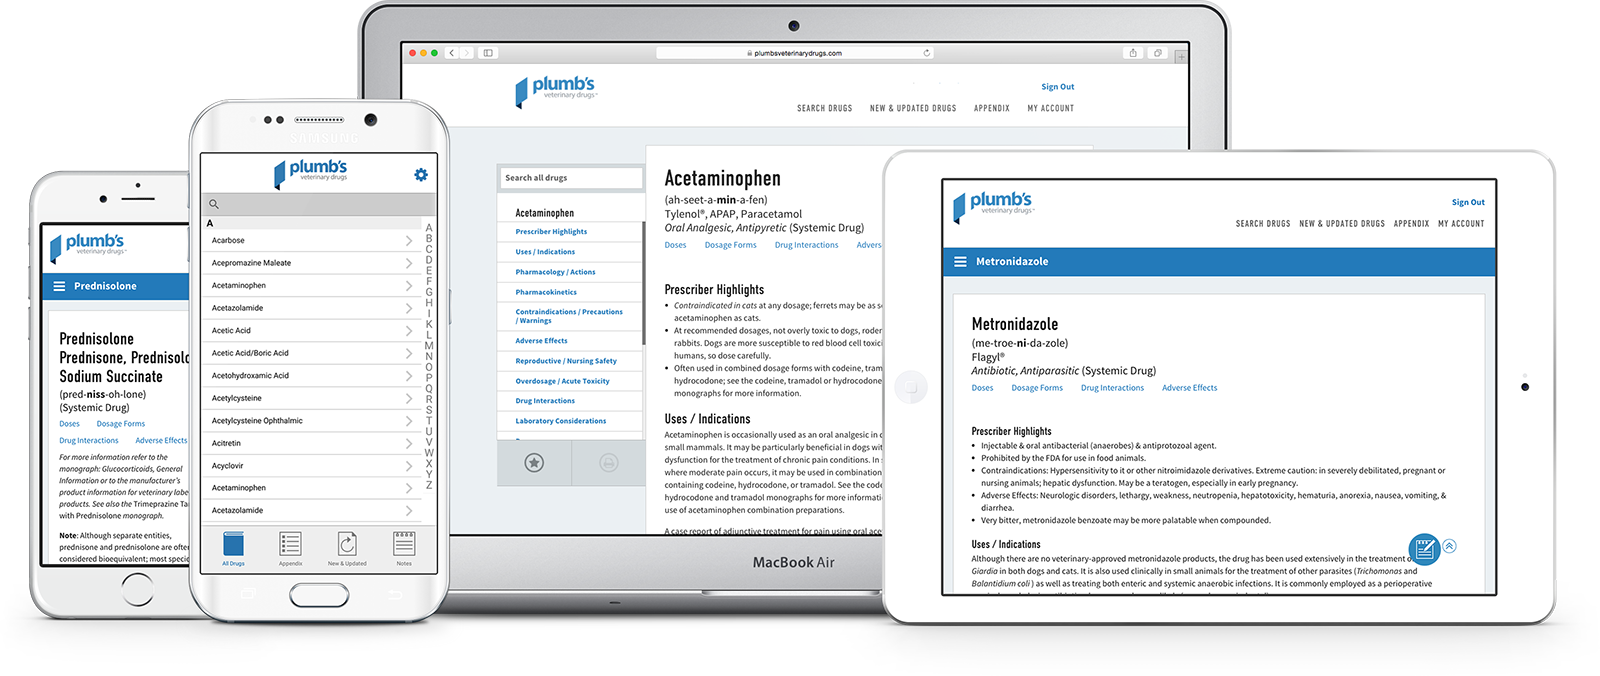 veterinary ebooks free download online